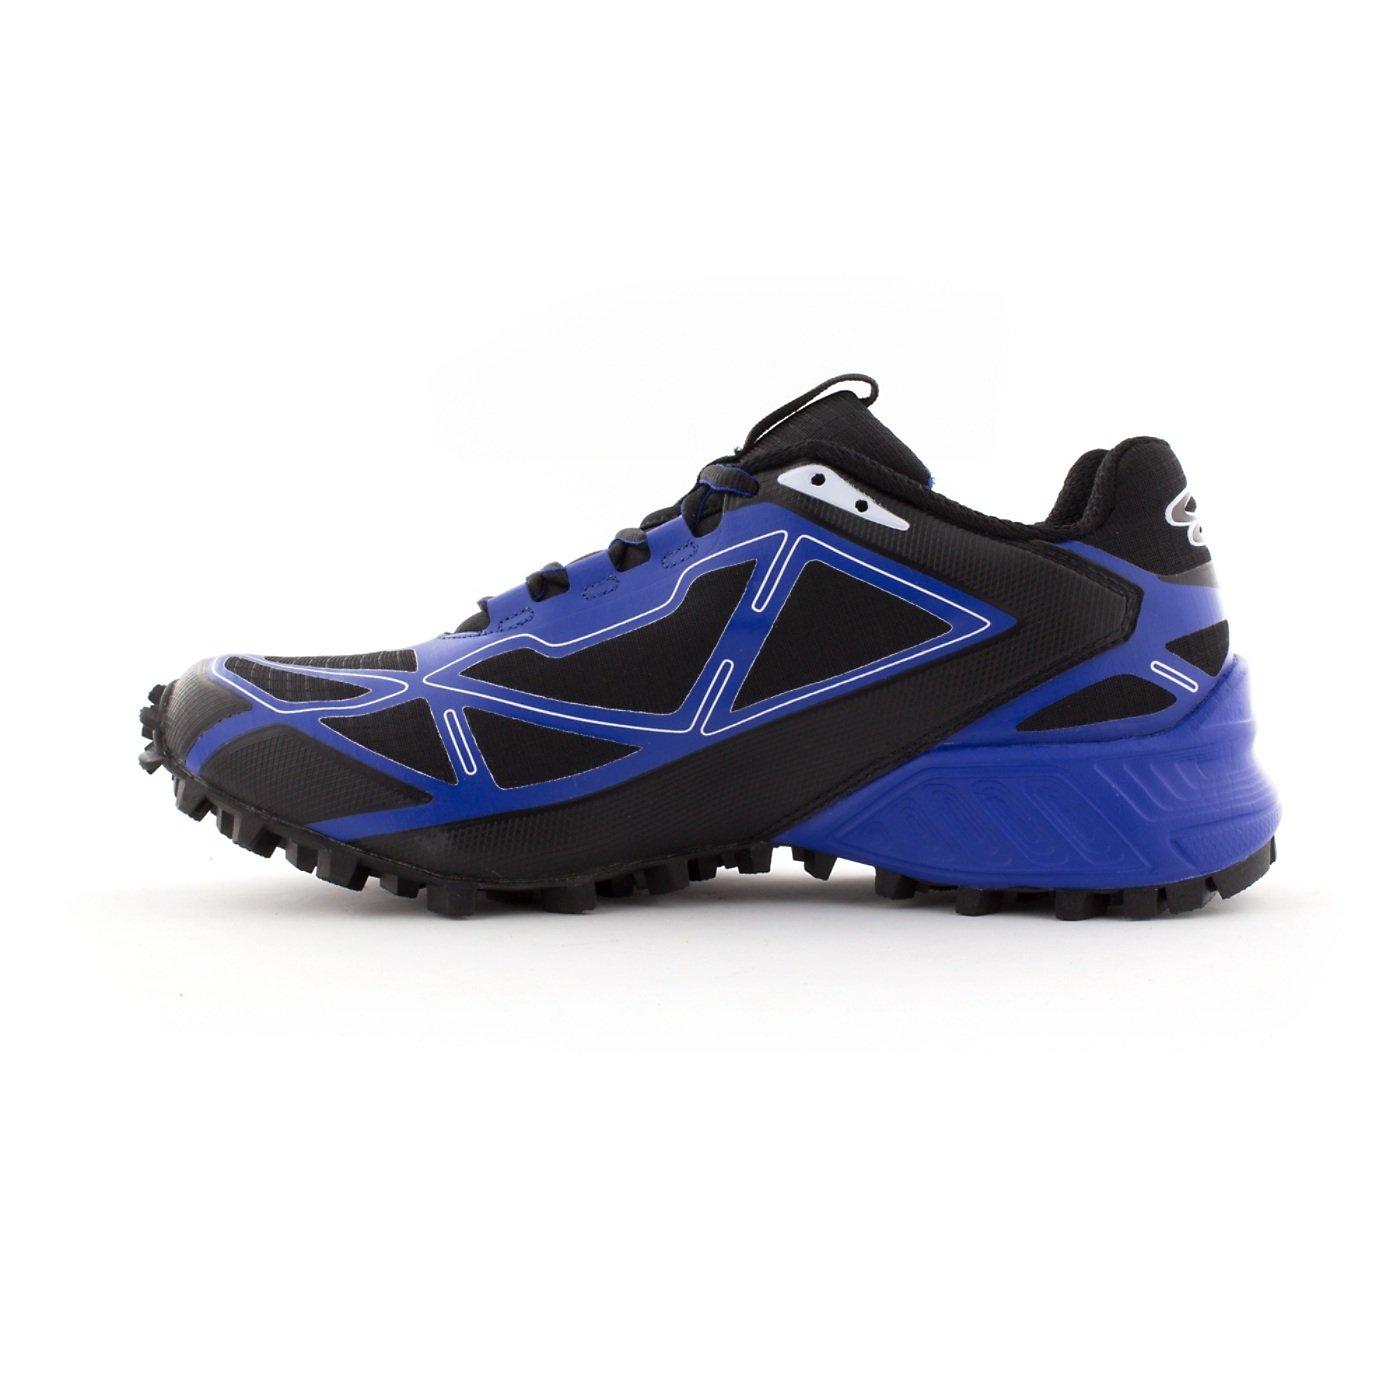 Boombah Men's Hellcat Trail Shoe - 14 Color Options - Multiple Sizes B073X6TNH2 14|Black/Royal